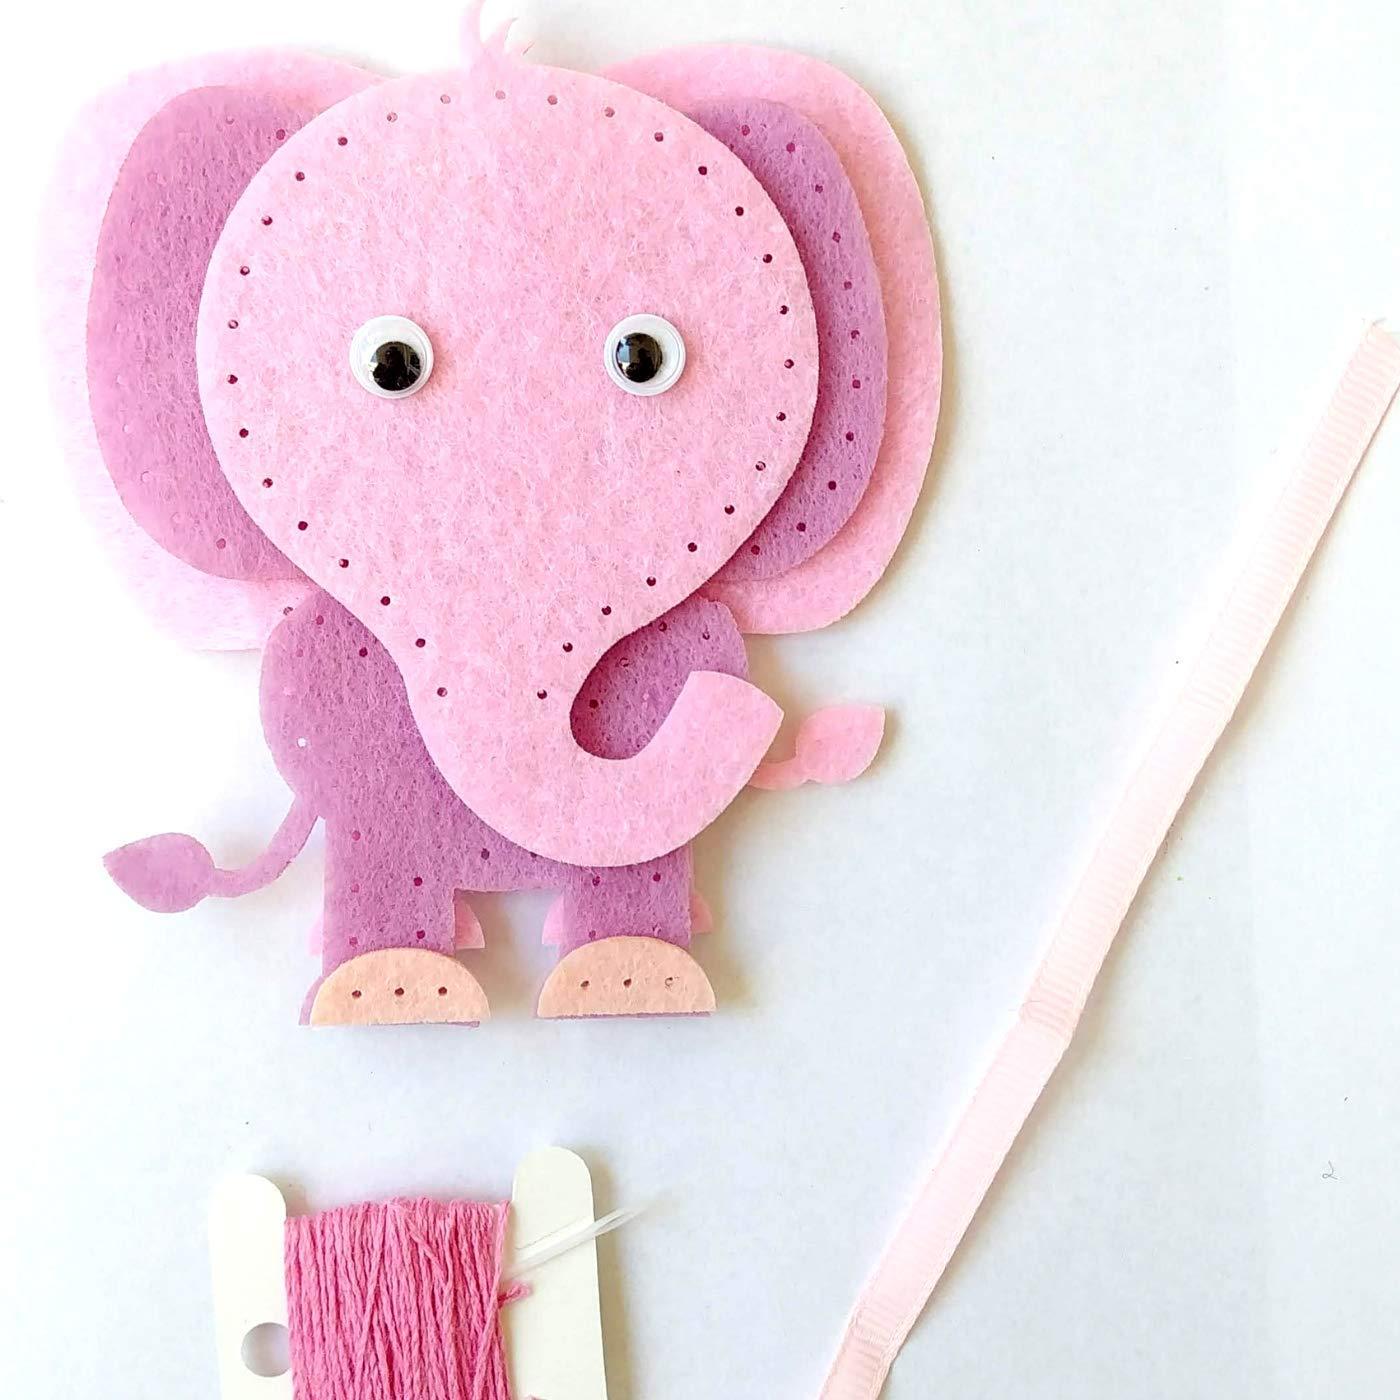 Pink Elephant Sewing Craft Kit MP Felt Animal Kit 1PCS